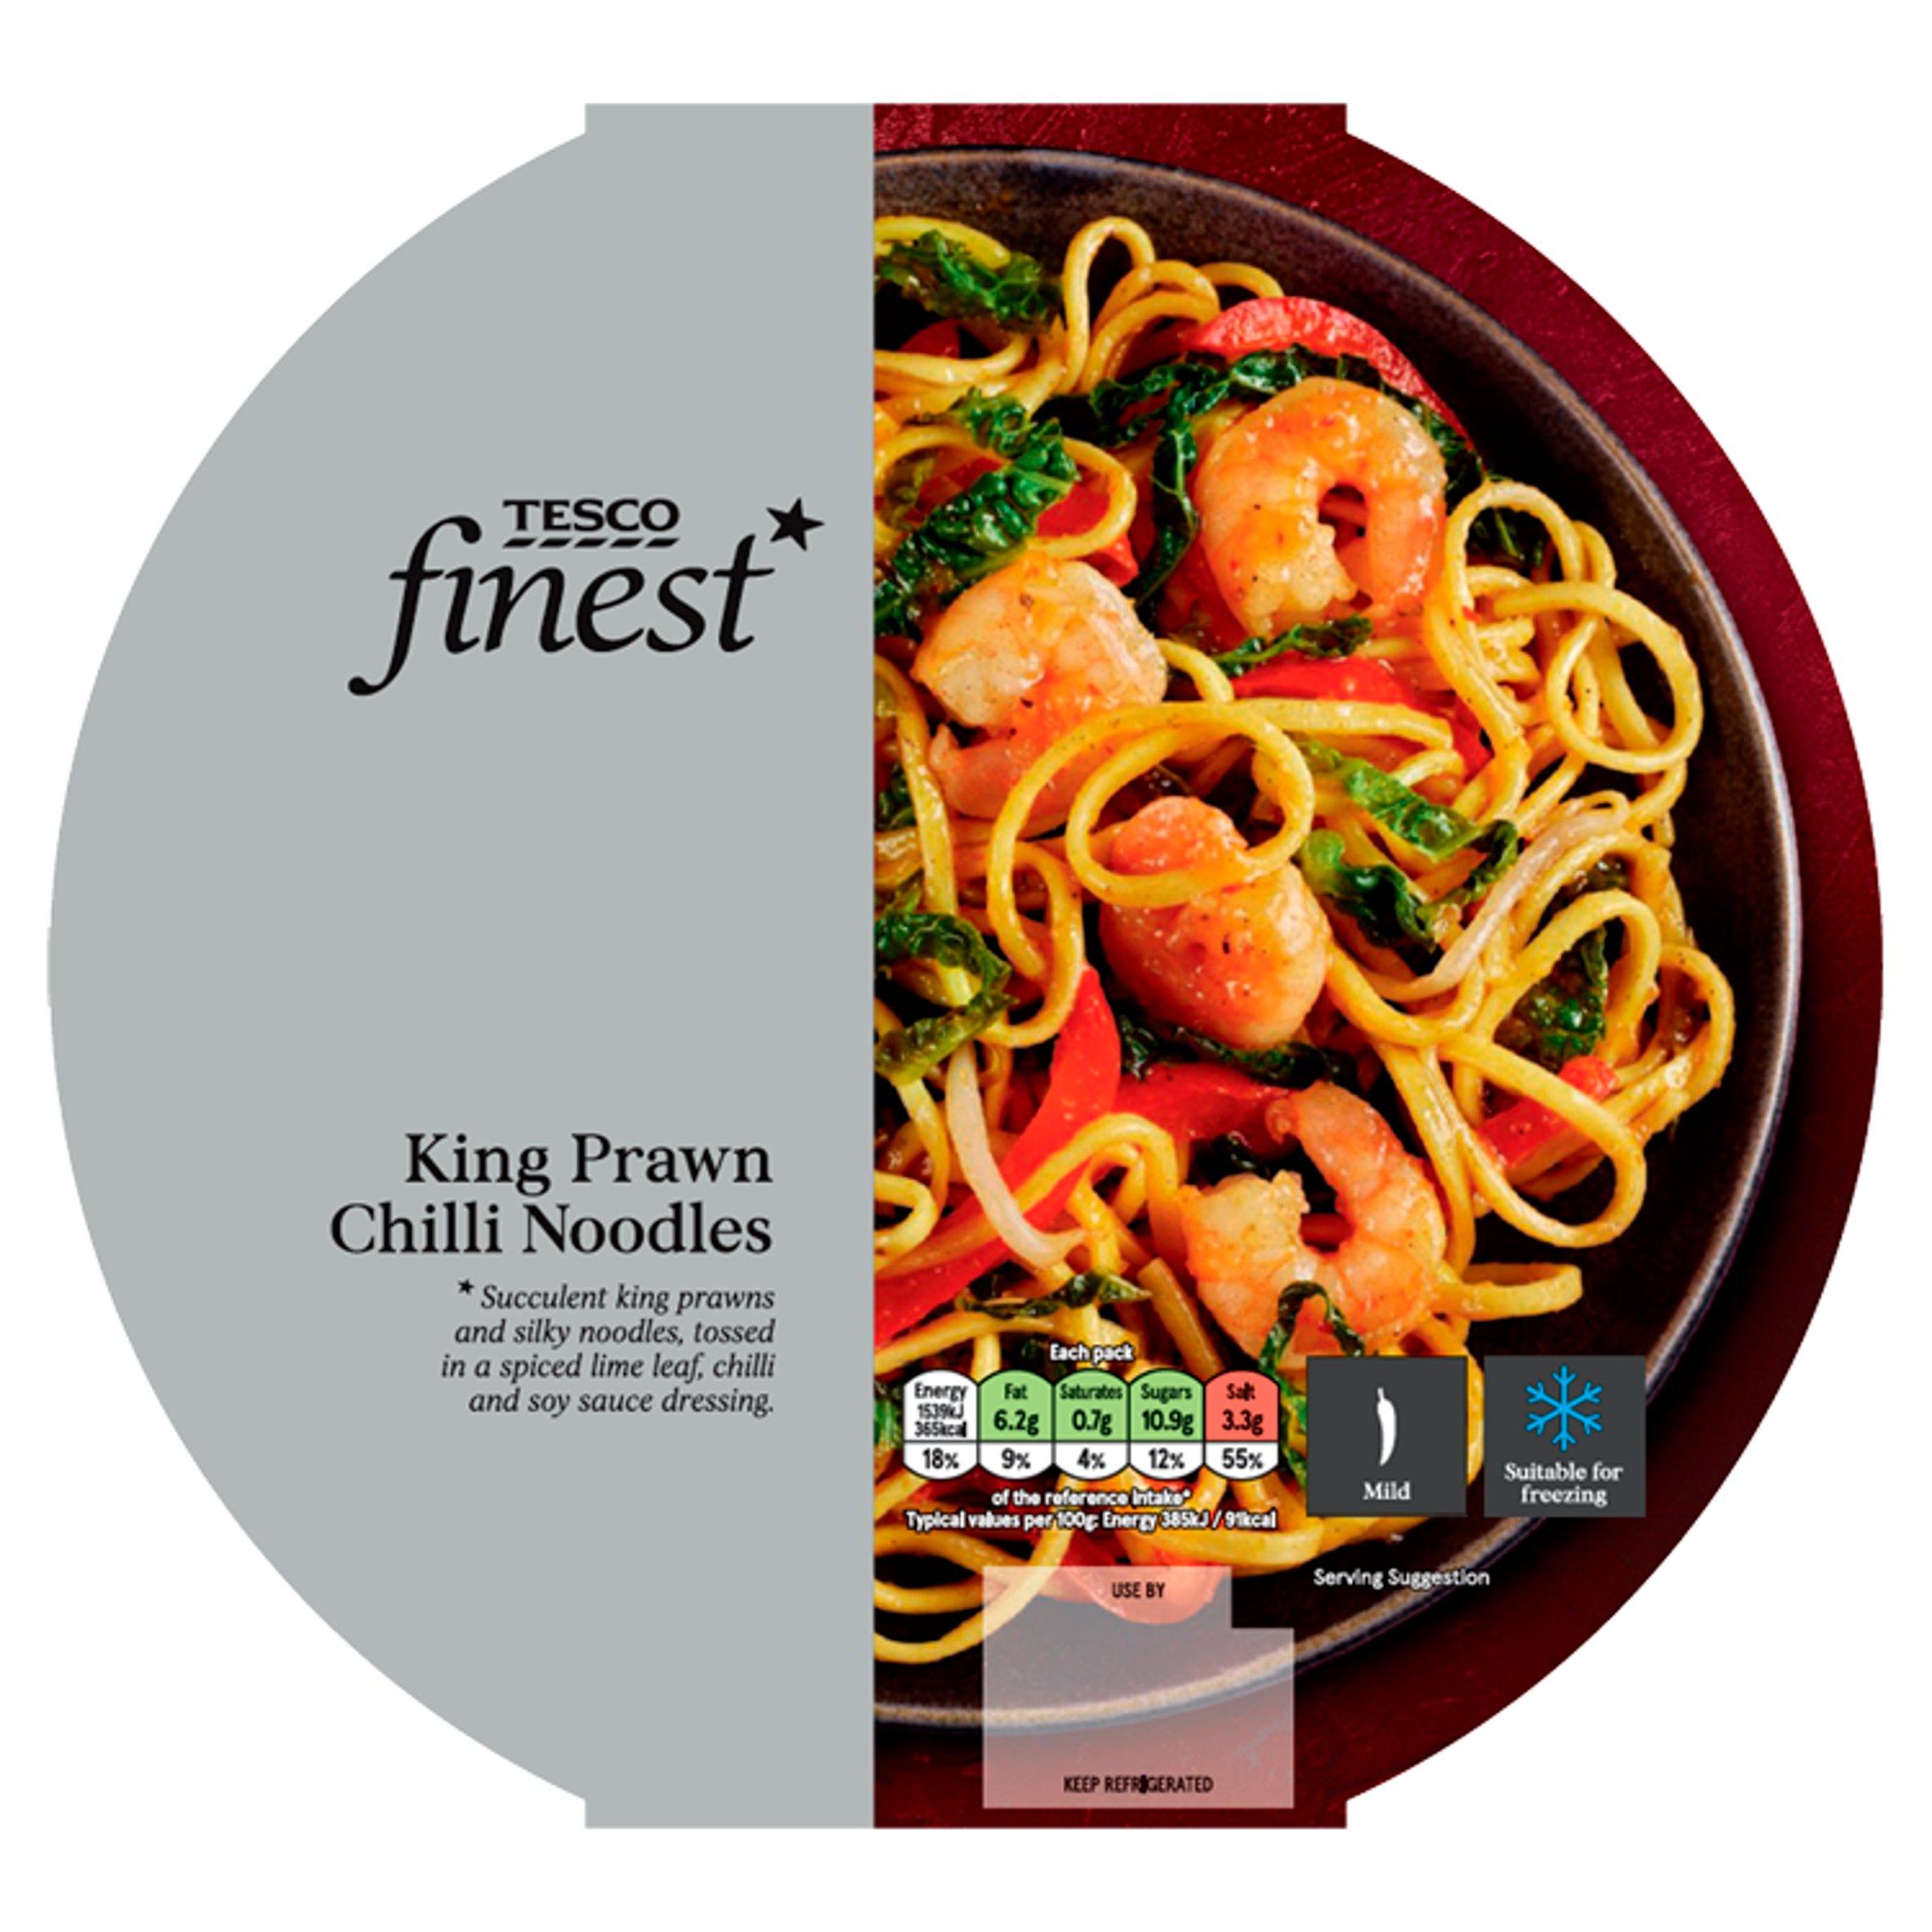 Tesco Finest King Prawn Chilli Noodles 400G